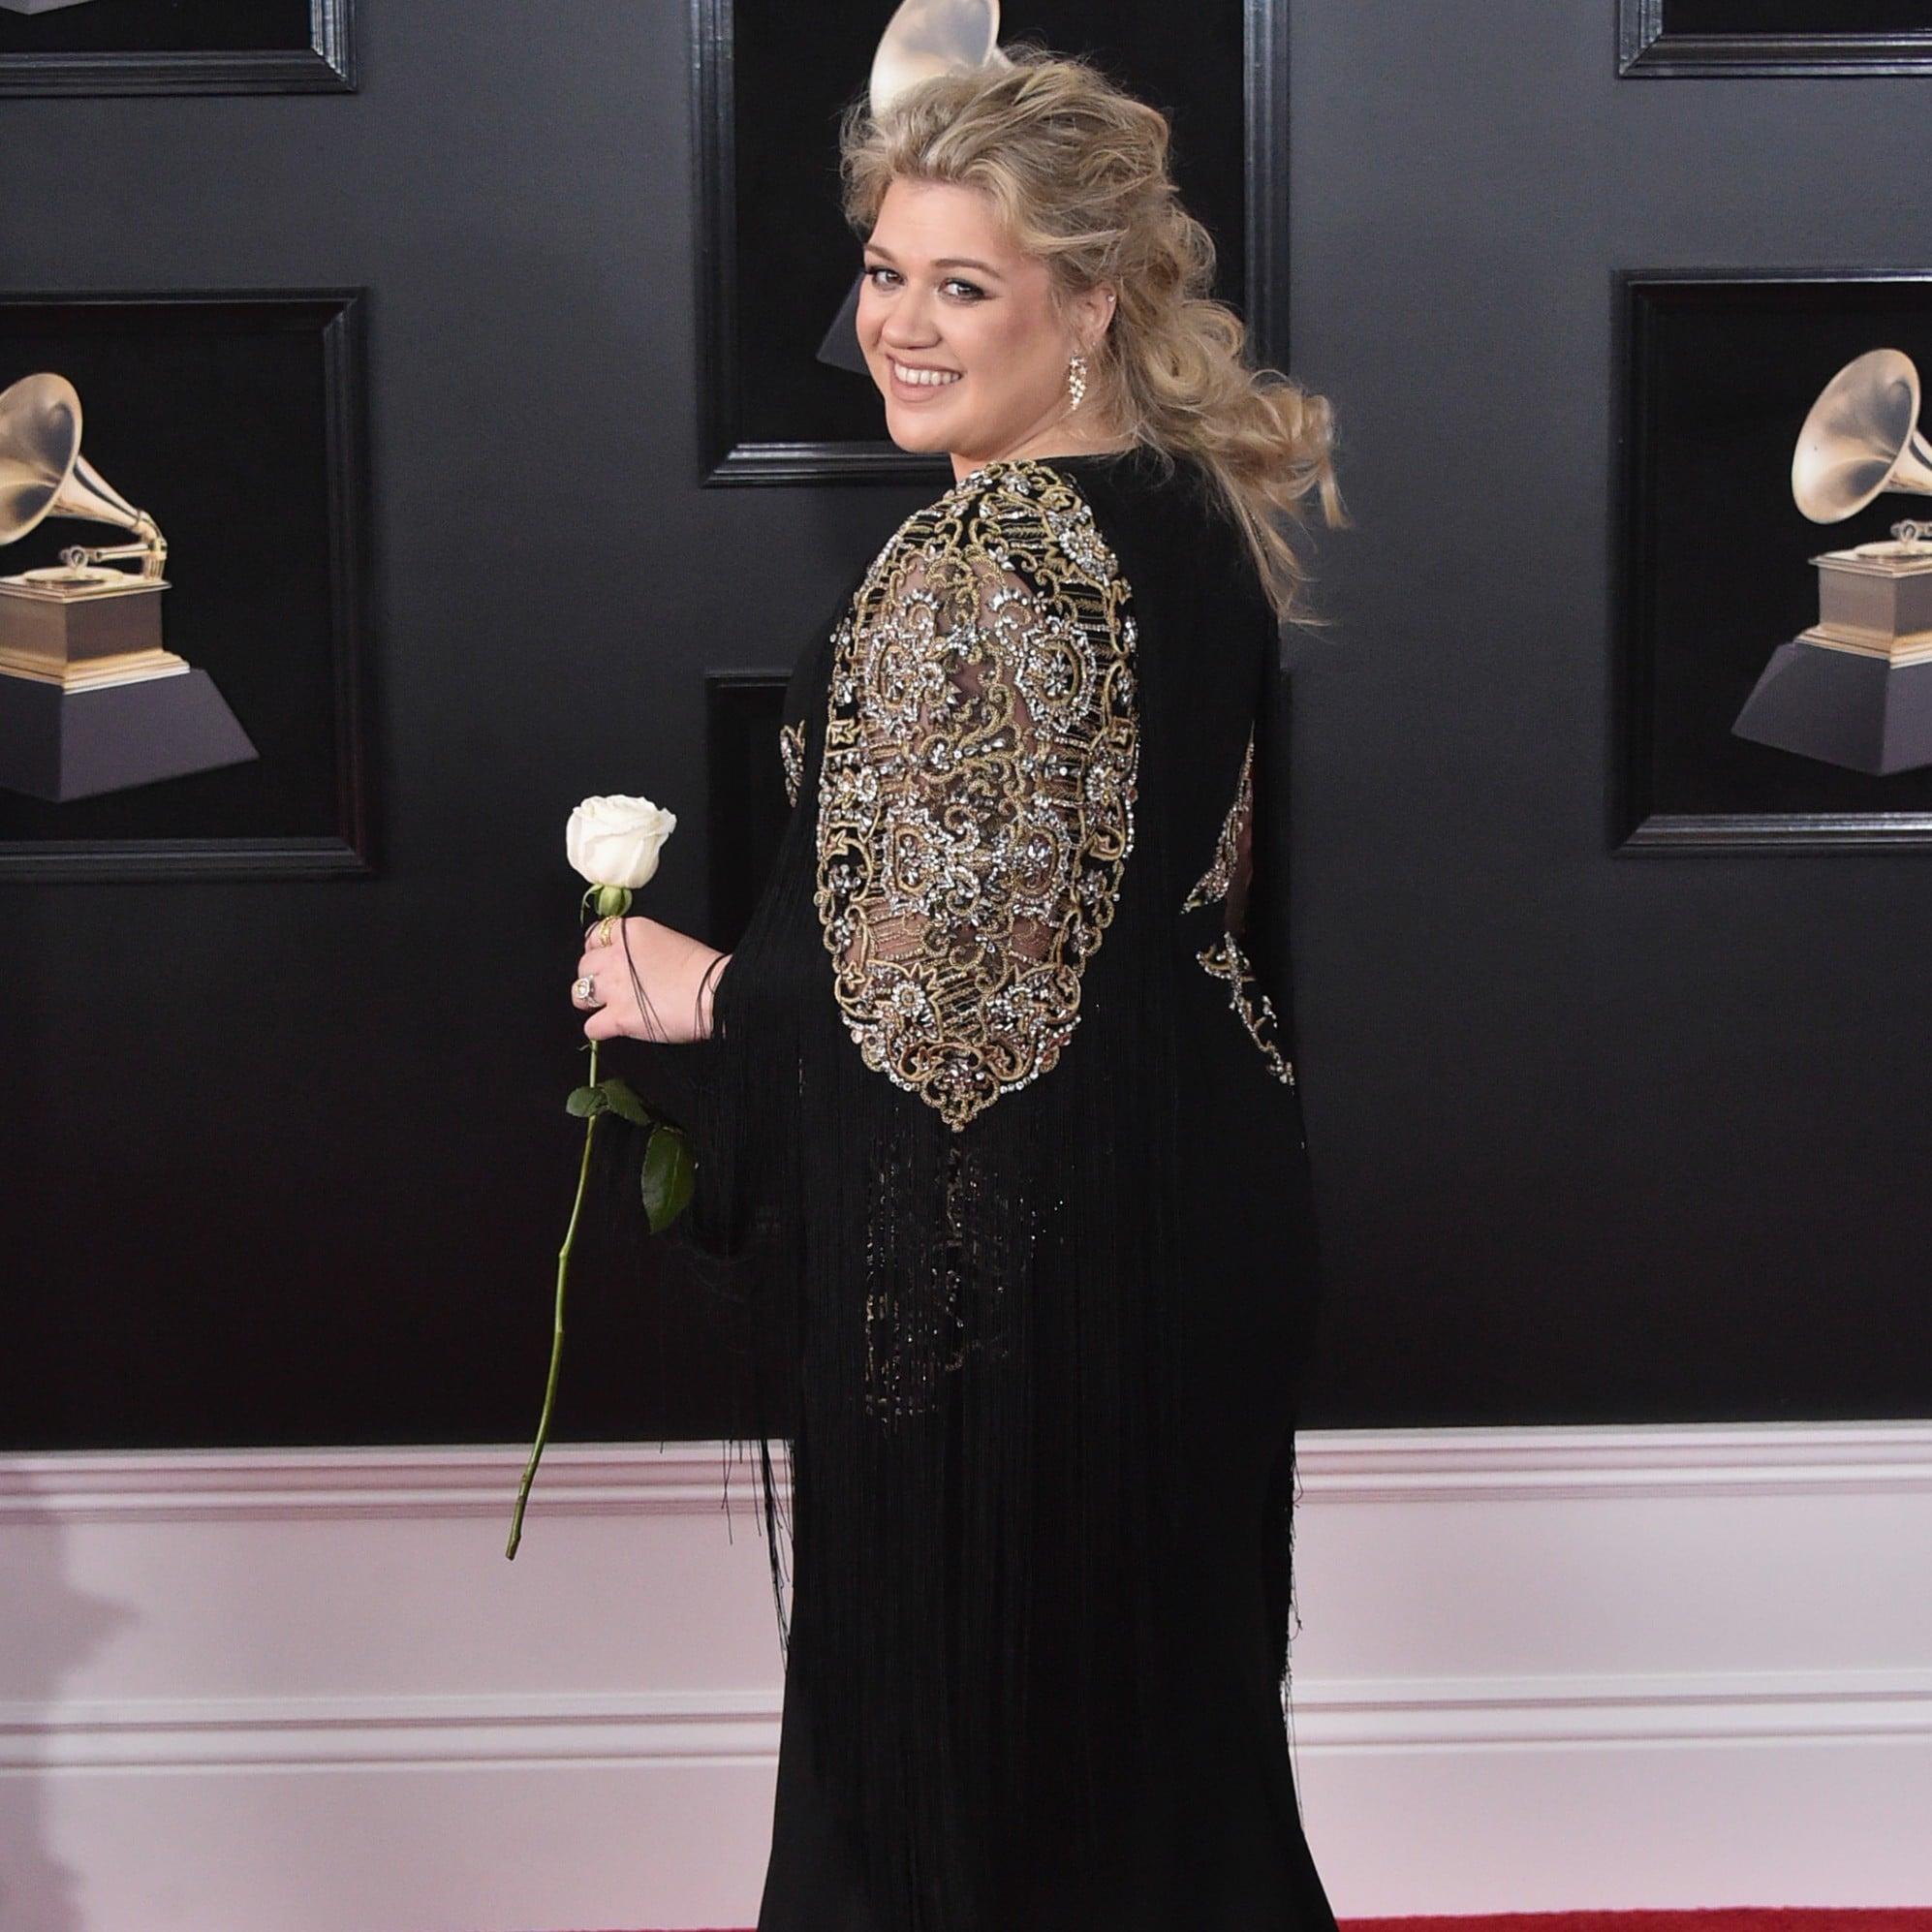 Kelly Clarkson Pussy Pics Minimalist cardi b stomach hair at the grammy awards | popsugar beauty